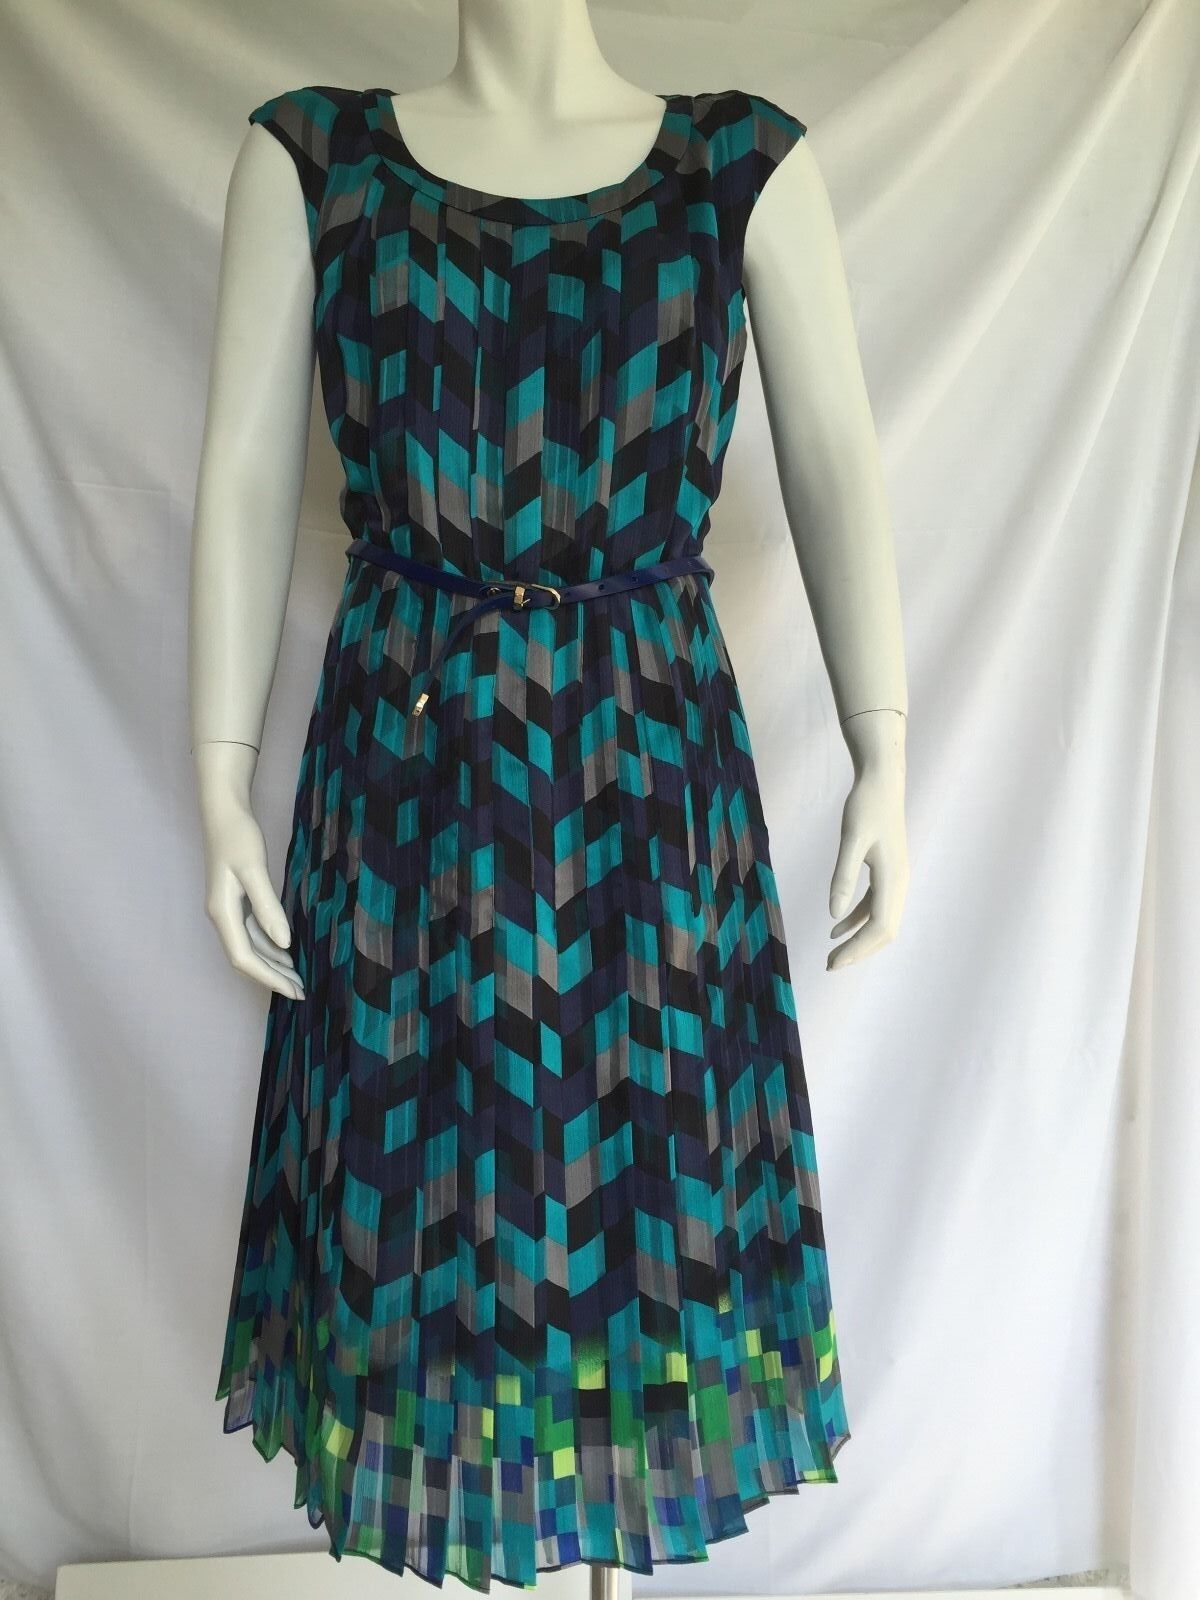 NWT Halogen Belted Cap Sleeve Pleat Dress Größe S Blau Tile